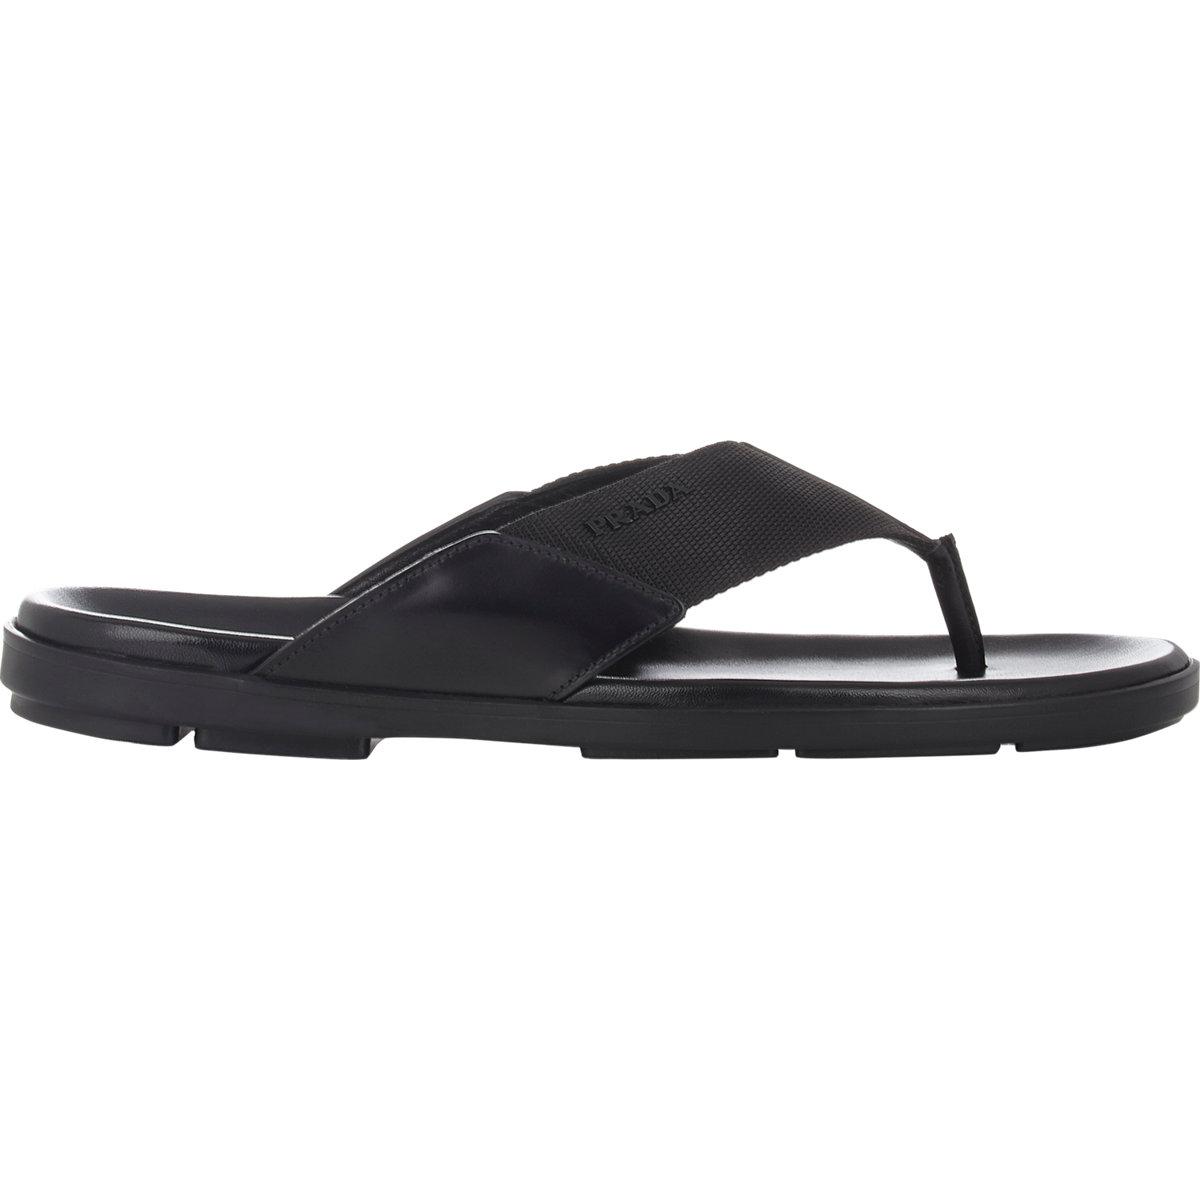 57e374f8b24fde Lyst - Prada Men s Spazzolato   Nylon Thong Sandals in Black for Men